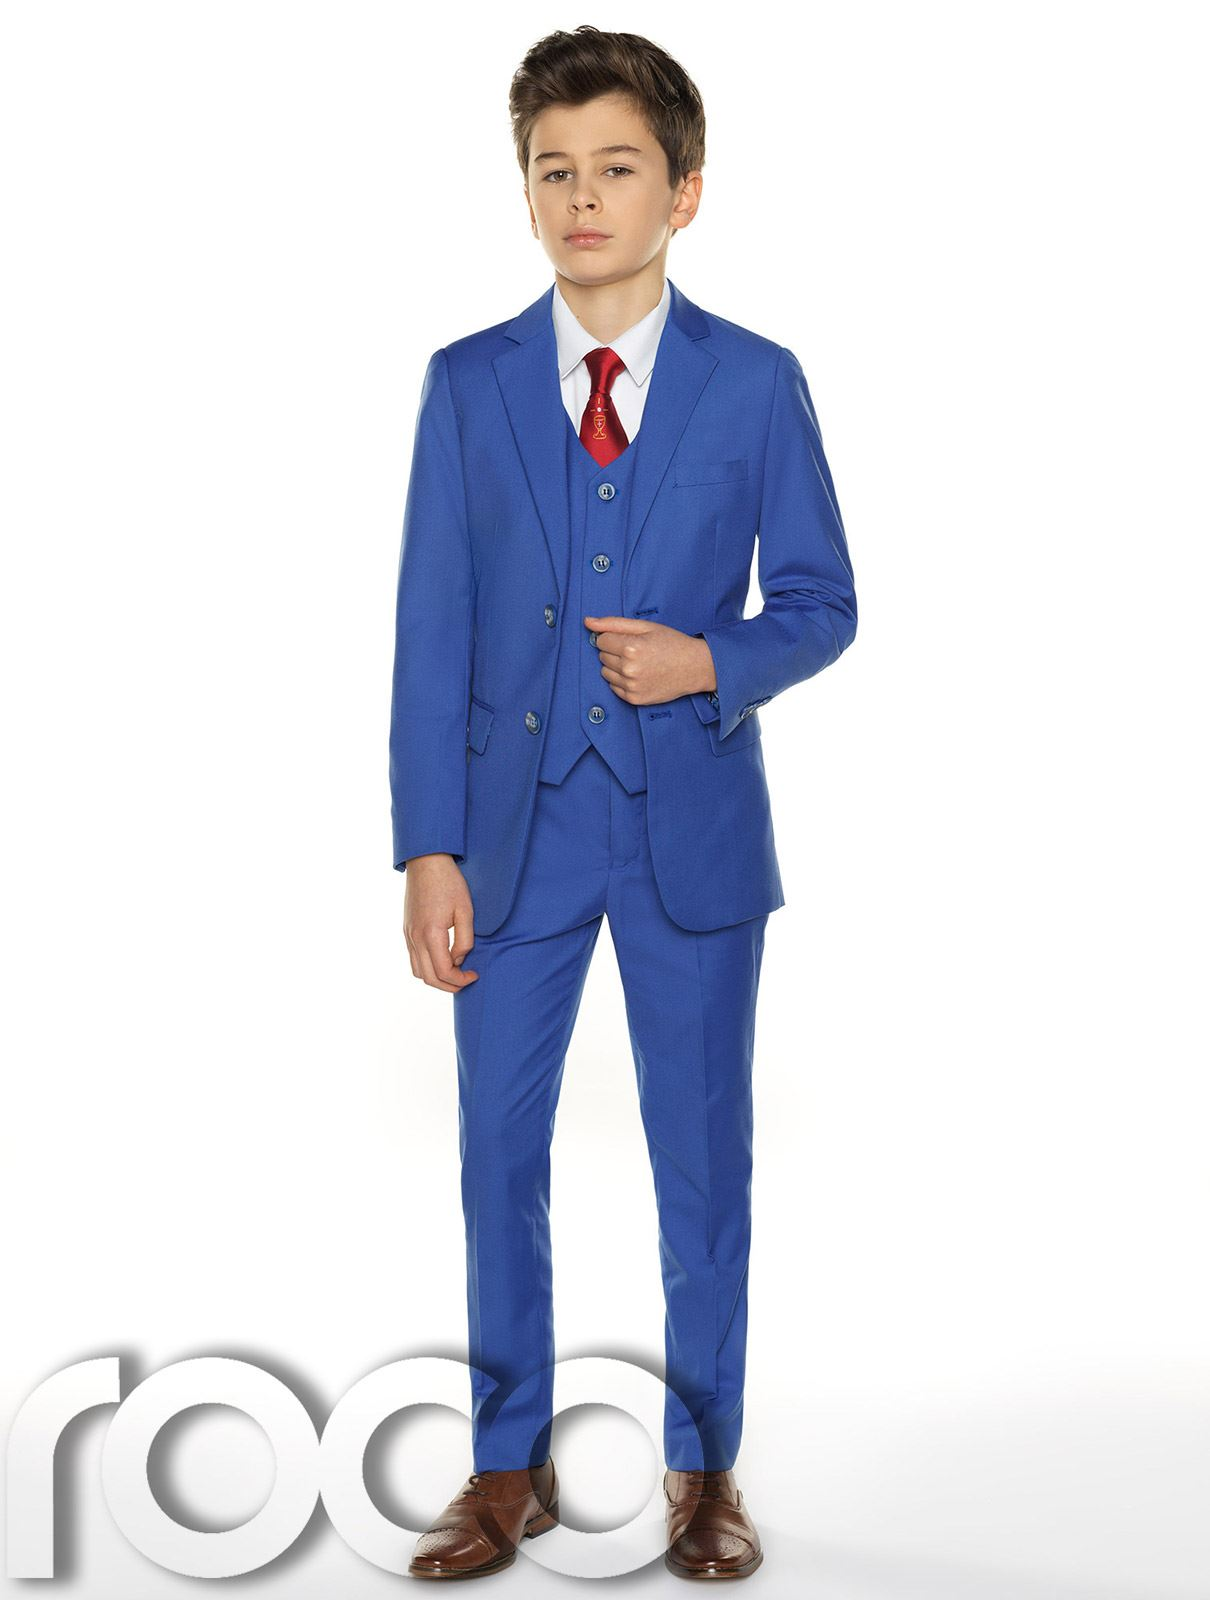 Garcons-Costume-Bleu-Communion-Costume-Bleu-Communion-Costume miniature 16